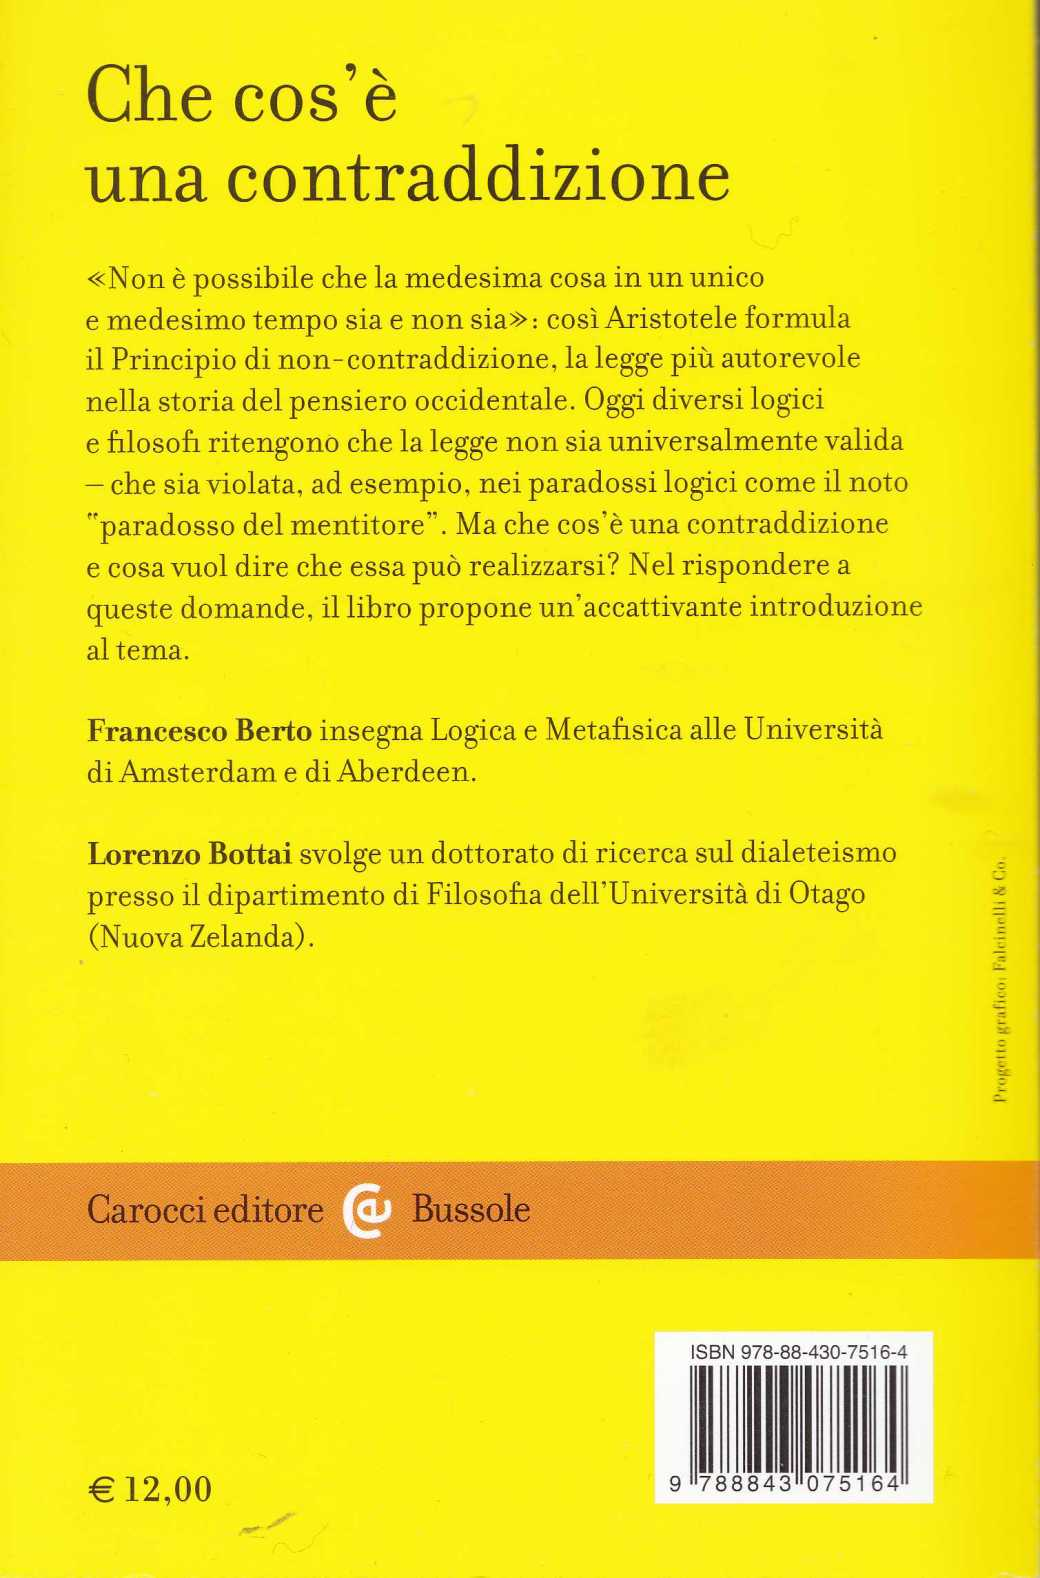 libri emanuele sevrino1917